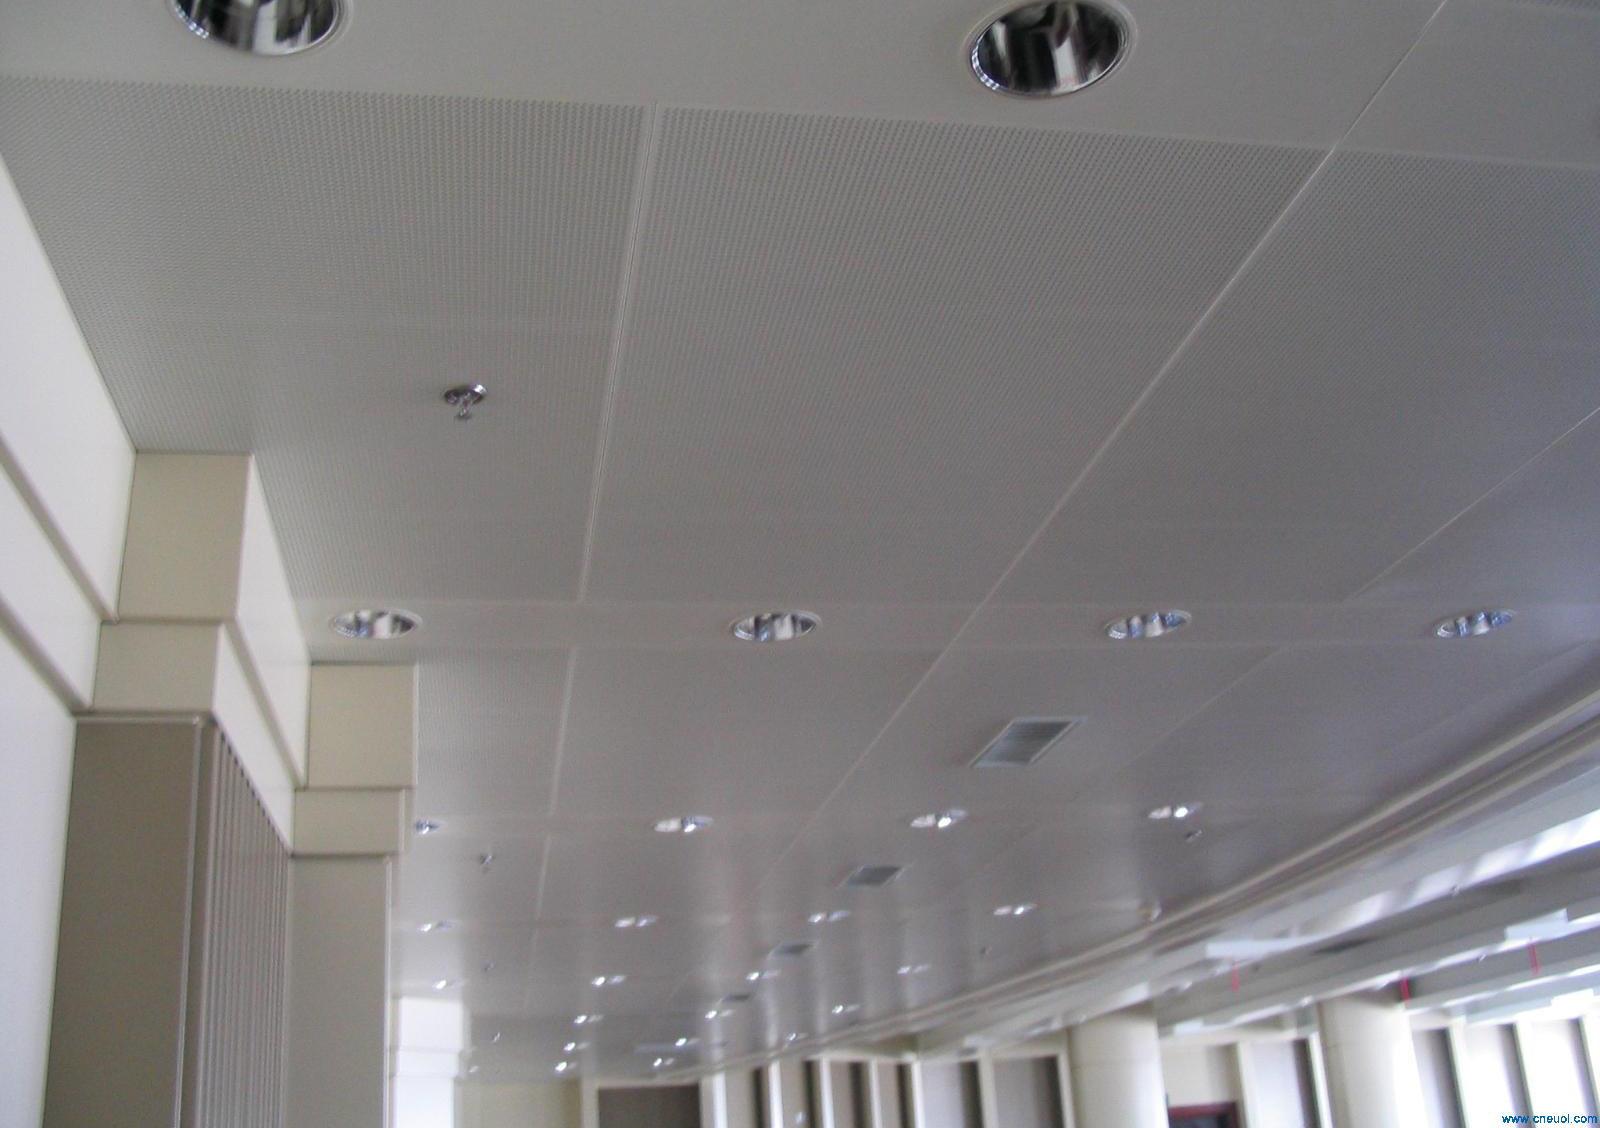 plafond acoustique perfor en m tal plafond acoustique perfor en m tal fournis par guangzhou. Black Bedroom Furniture Sets. Home Design Ideas